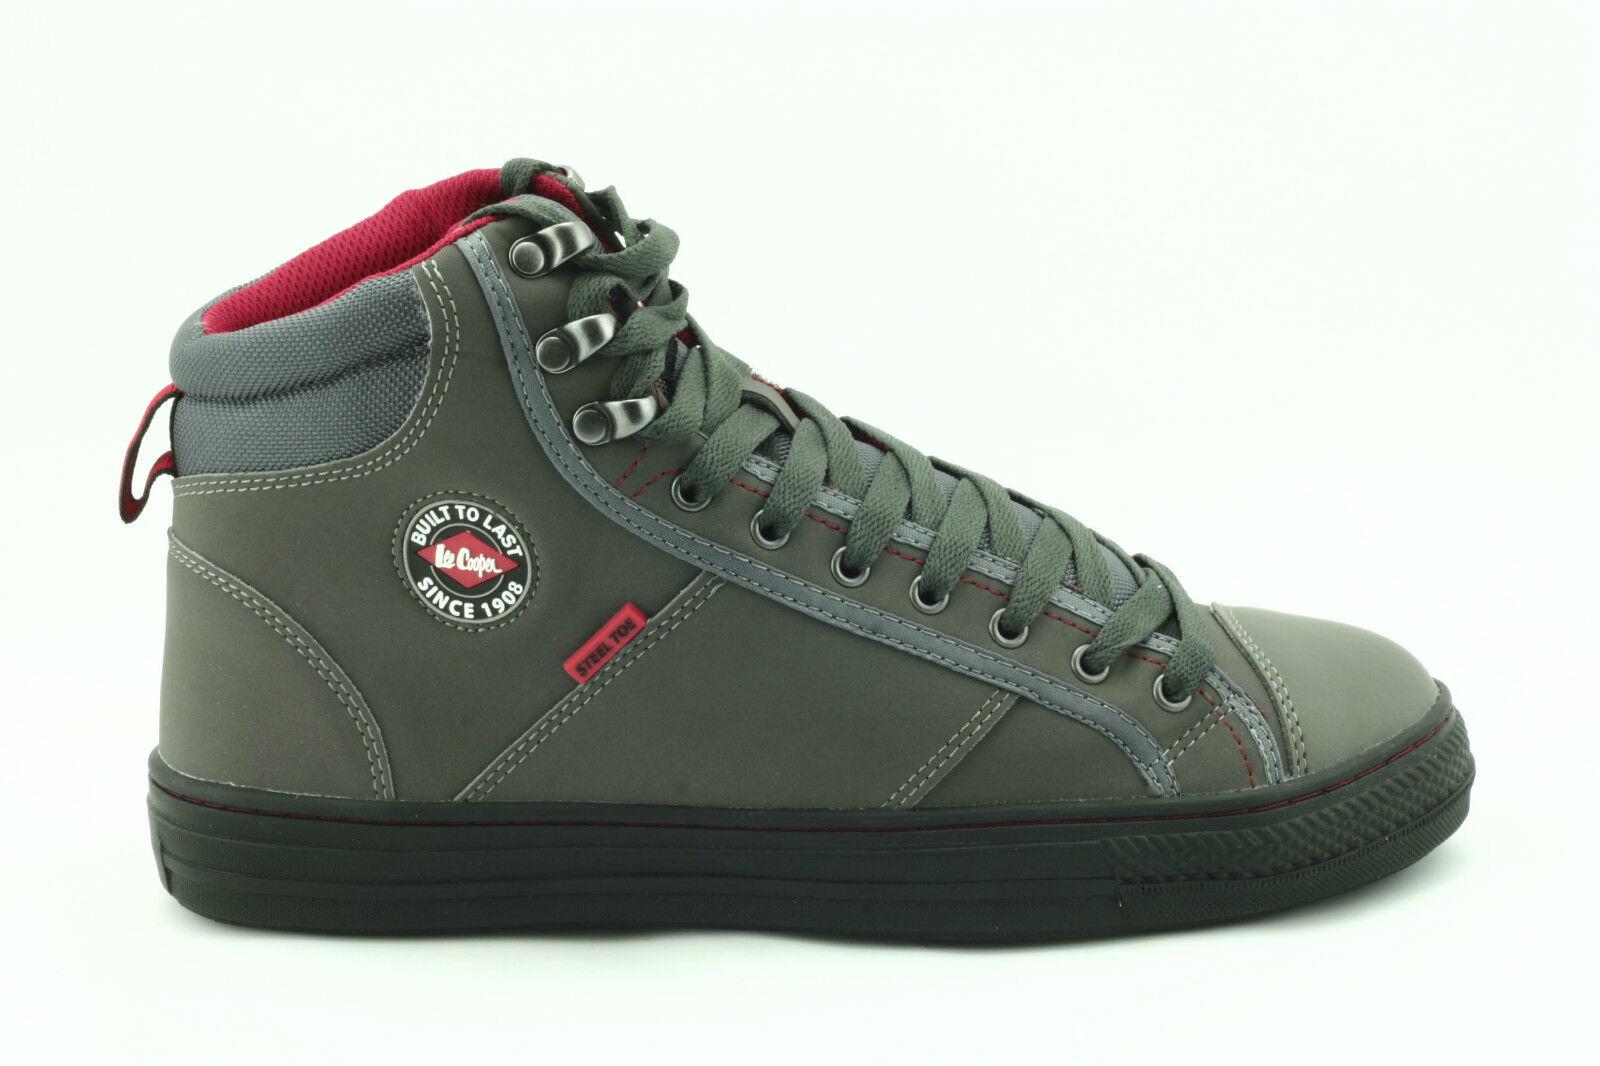 Lee Cooper Workwear Baseball Mens Safety Shoes Grey 9 UK for sale ... 58db9b875